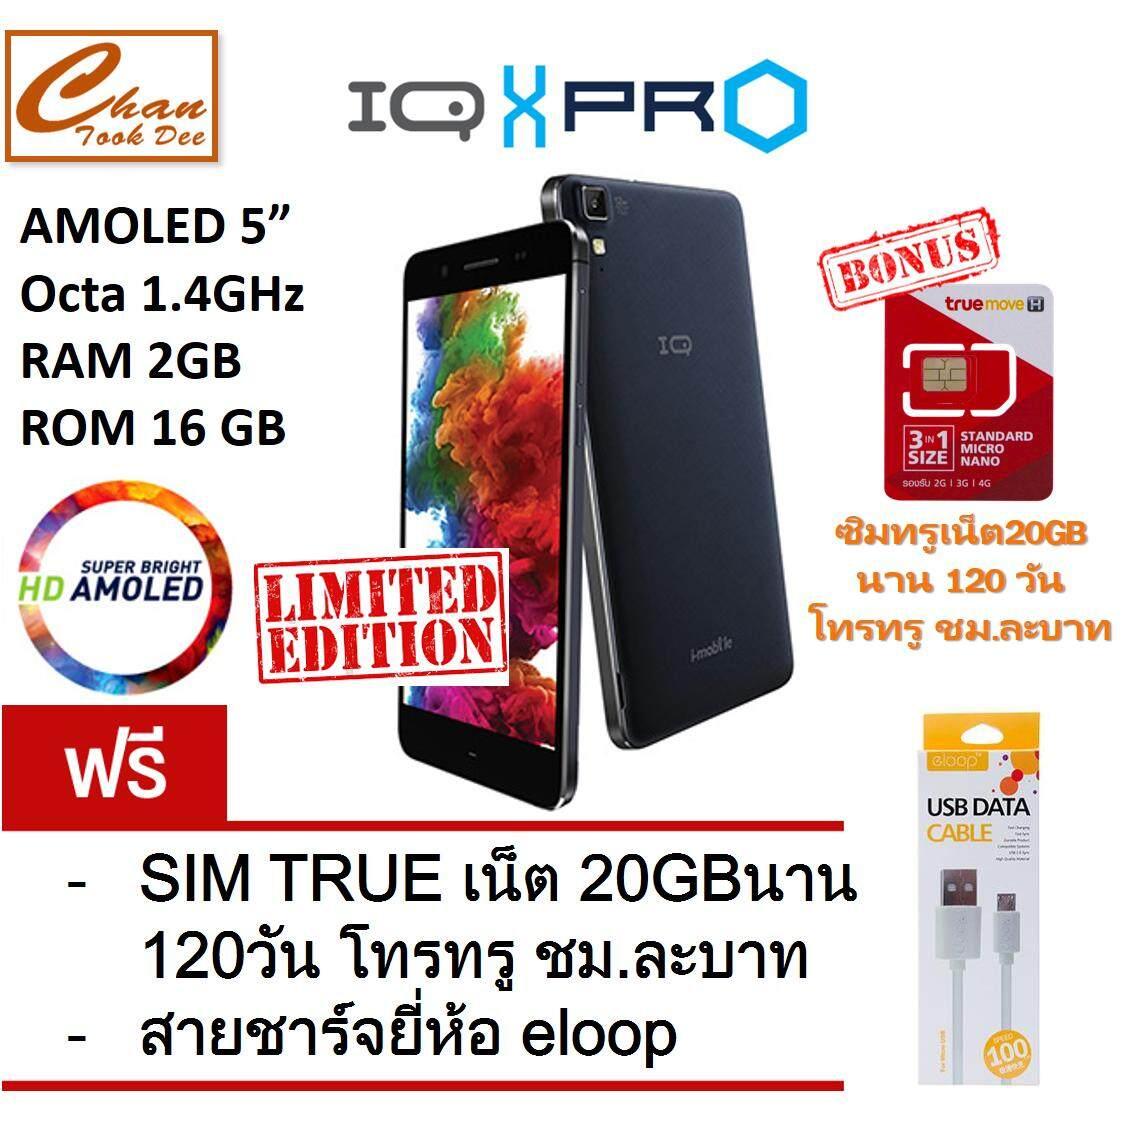 "i-mobile IQ X PRO จอ AMOLED 5"" คมชัด OCTA 1.4GHz   ROM 16 GB / RAM 2GB ฟรี สายชาร์จยี่ห้อ eloop + ซิมทรูเน็ต20GB  นาน 120 วัน โทรทรู ชม.ละบาท"